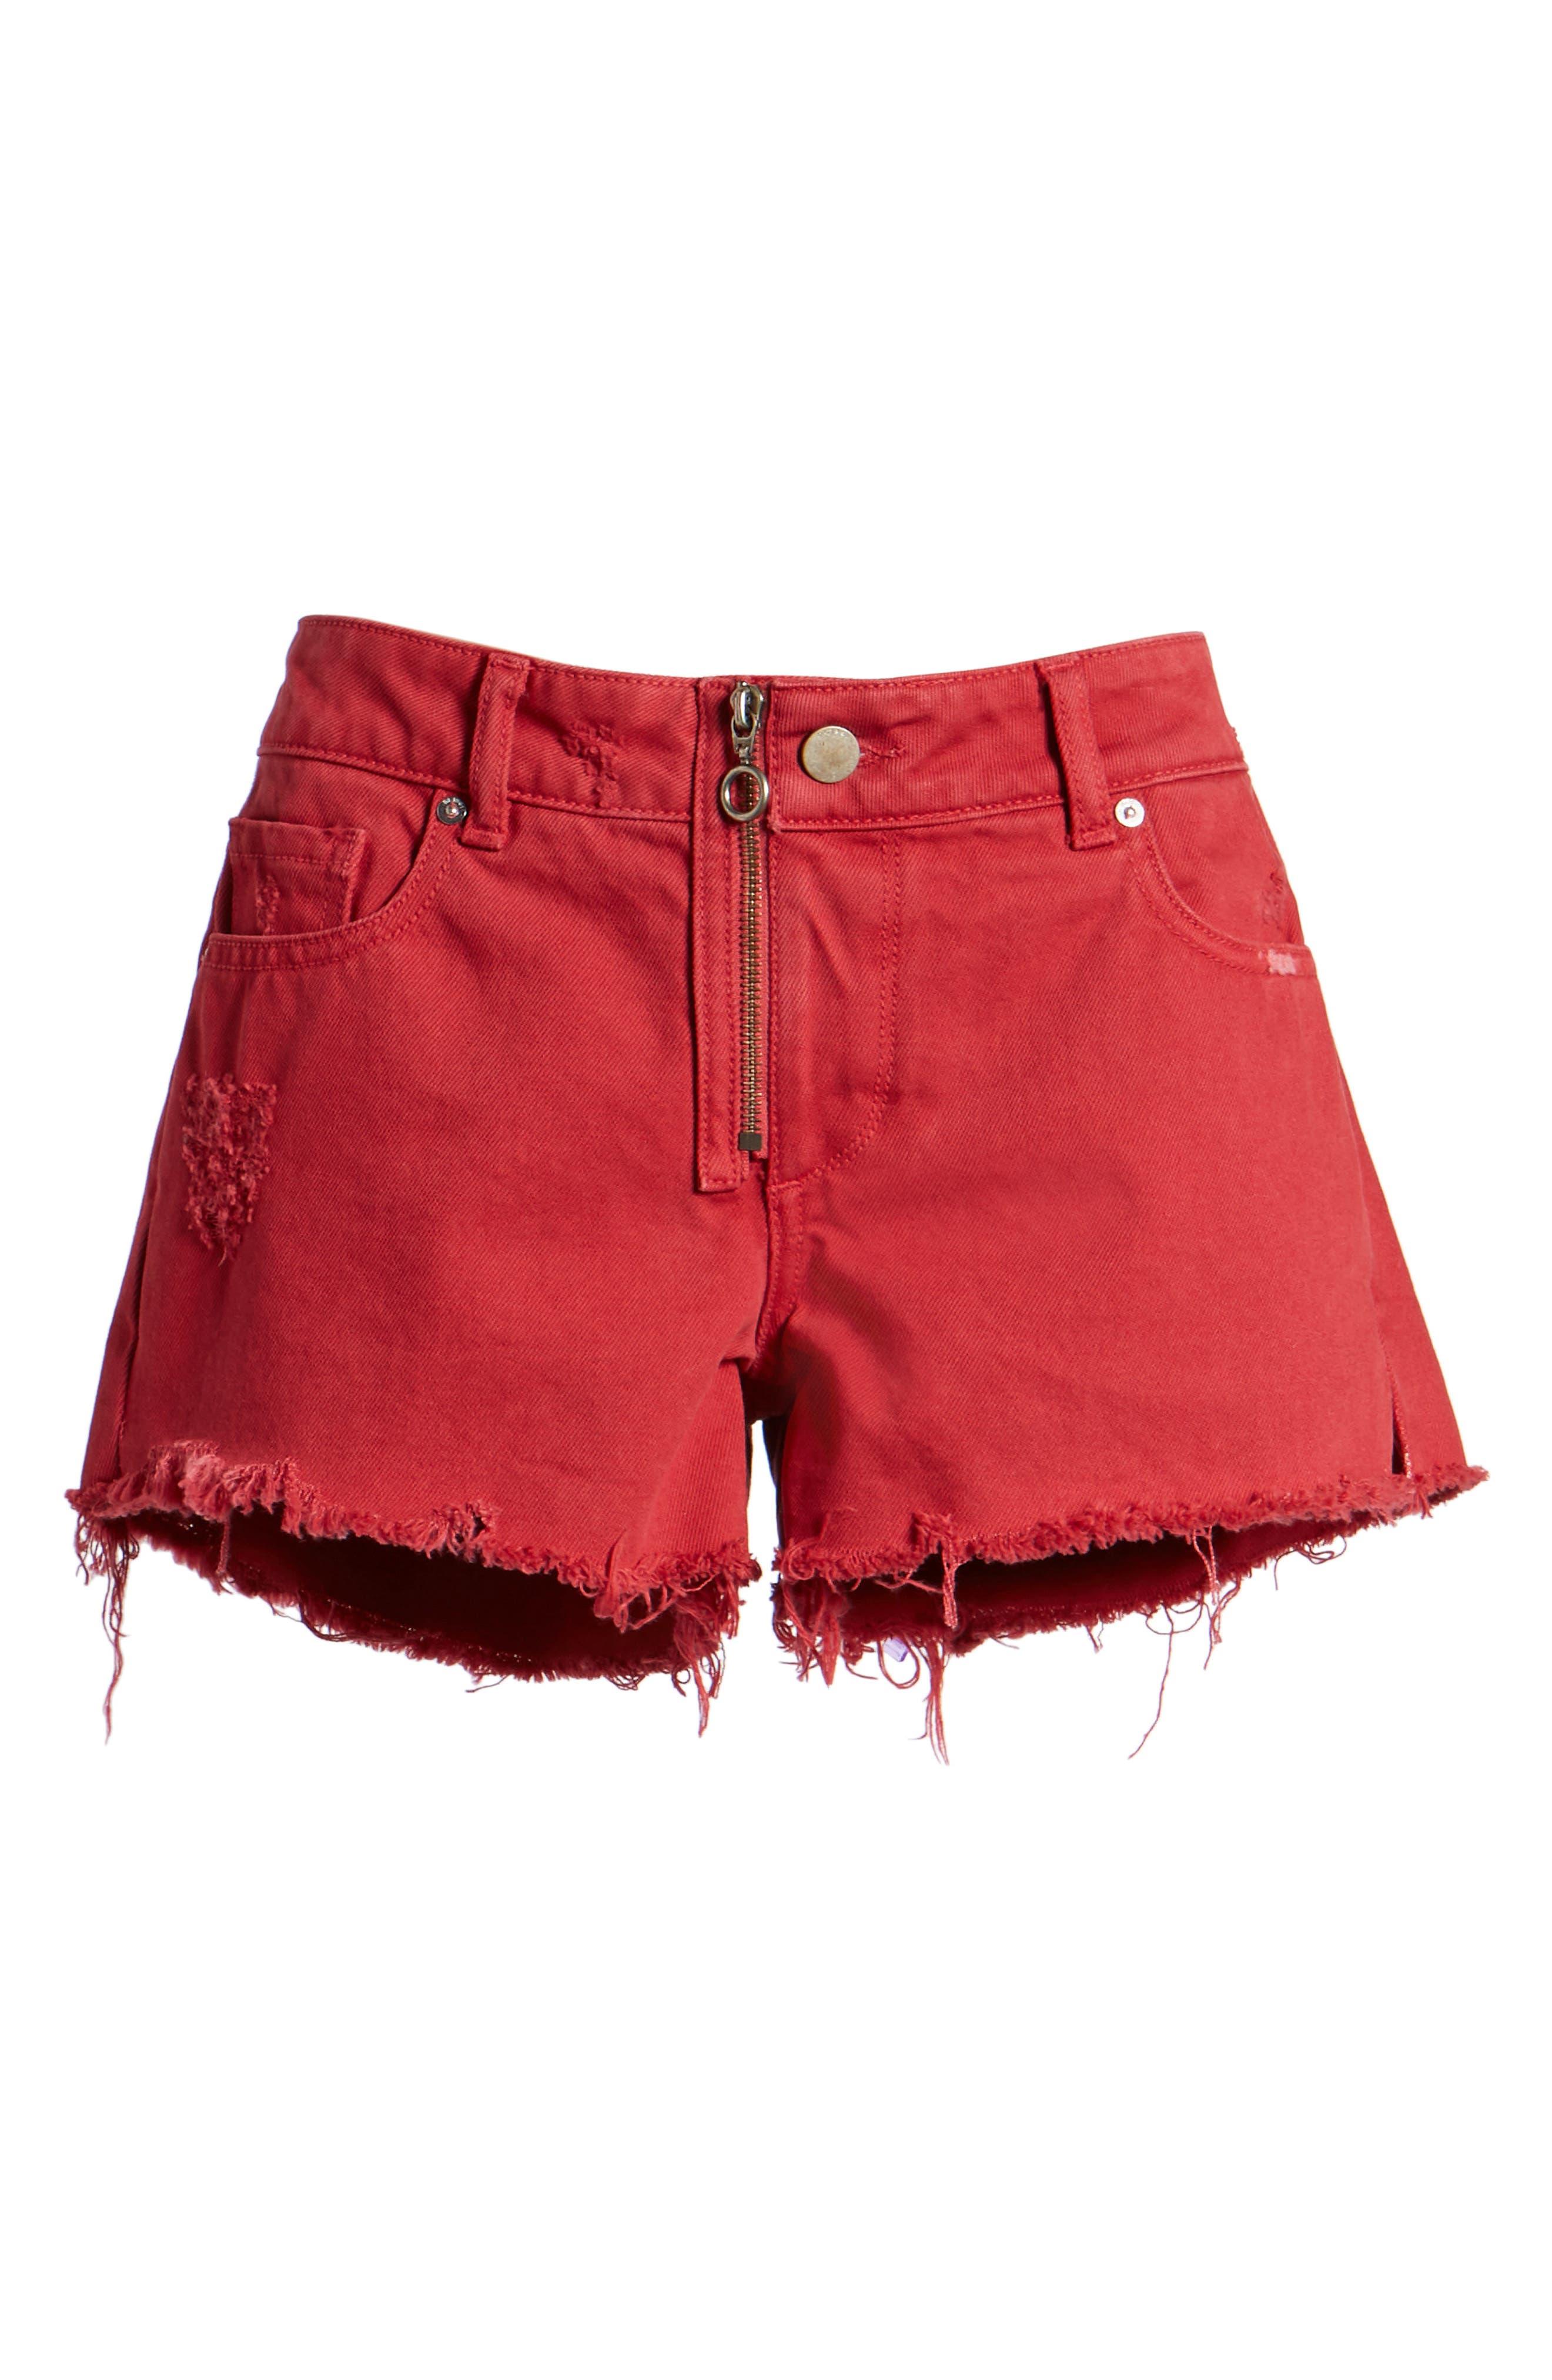 Renee Cutoff Denim Shorts,                             Alternate thumbnail 7, color,                             CHERRY BOMB